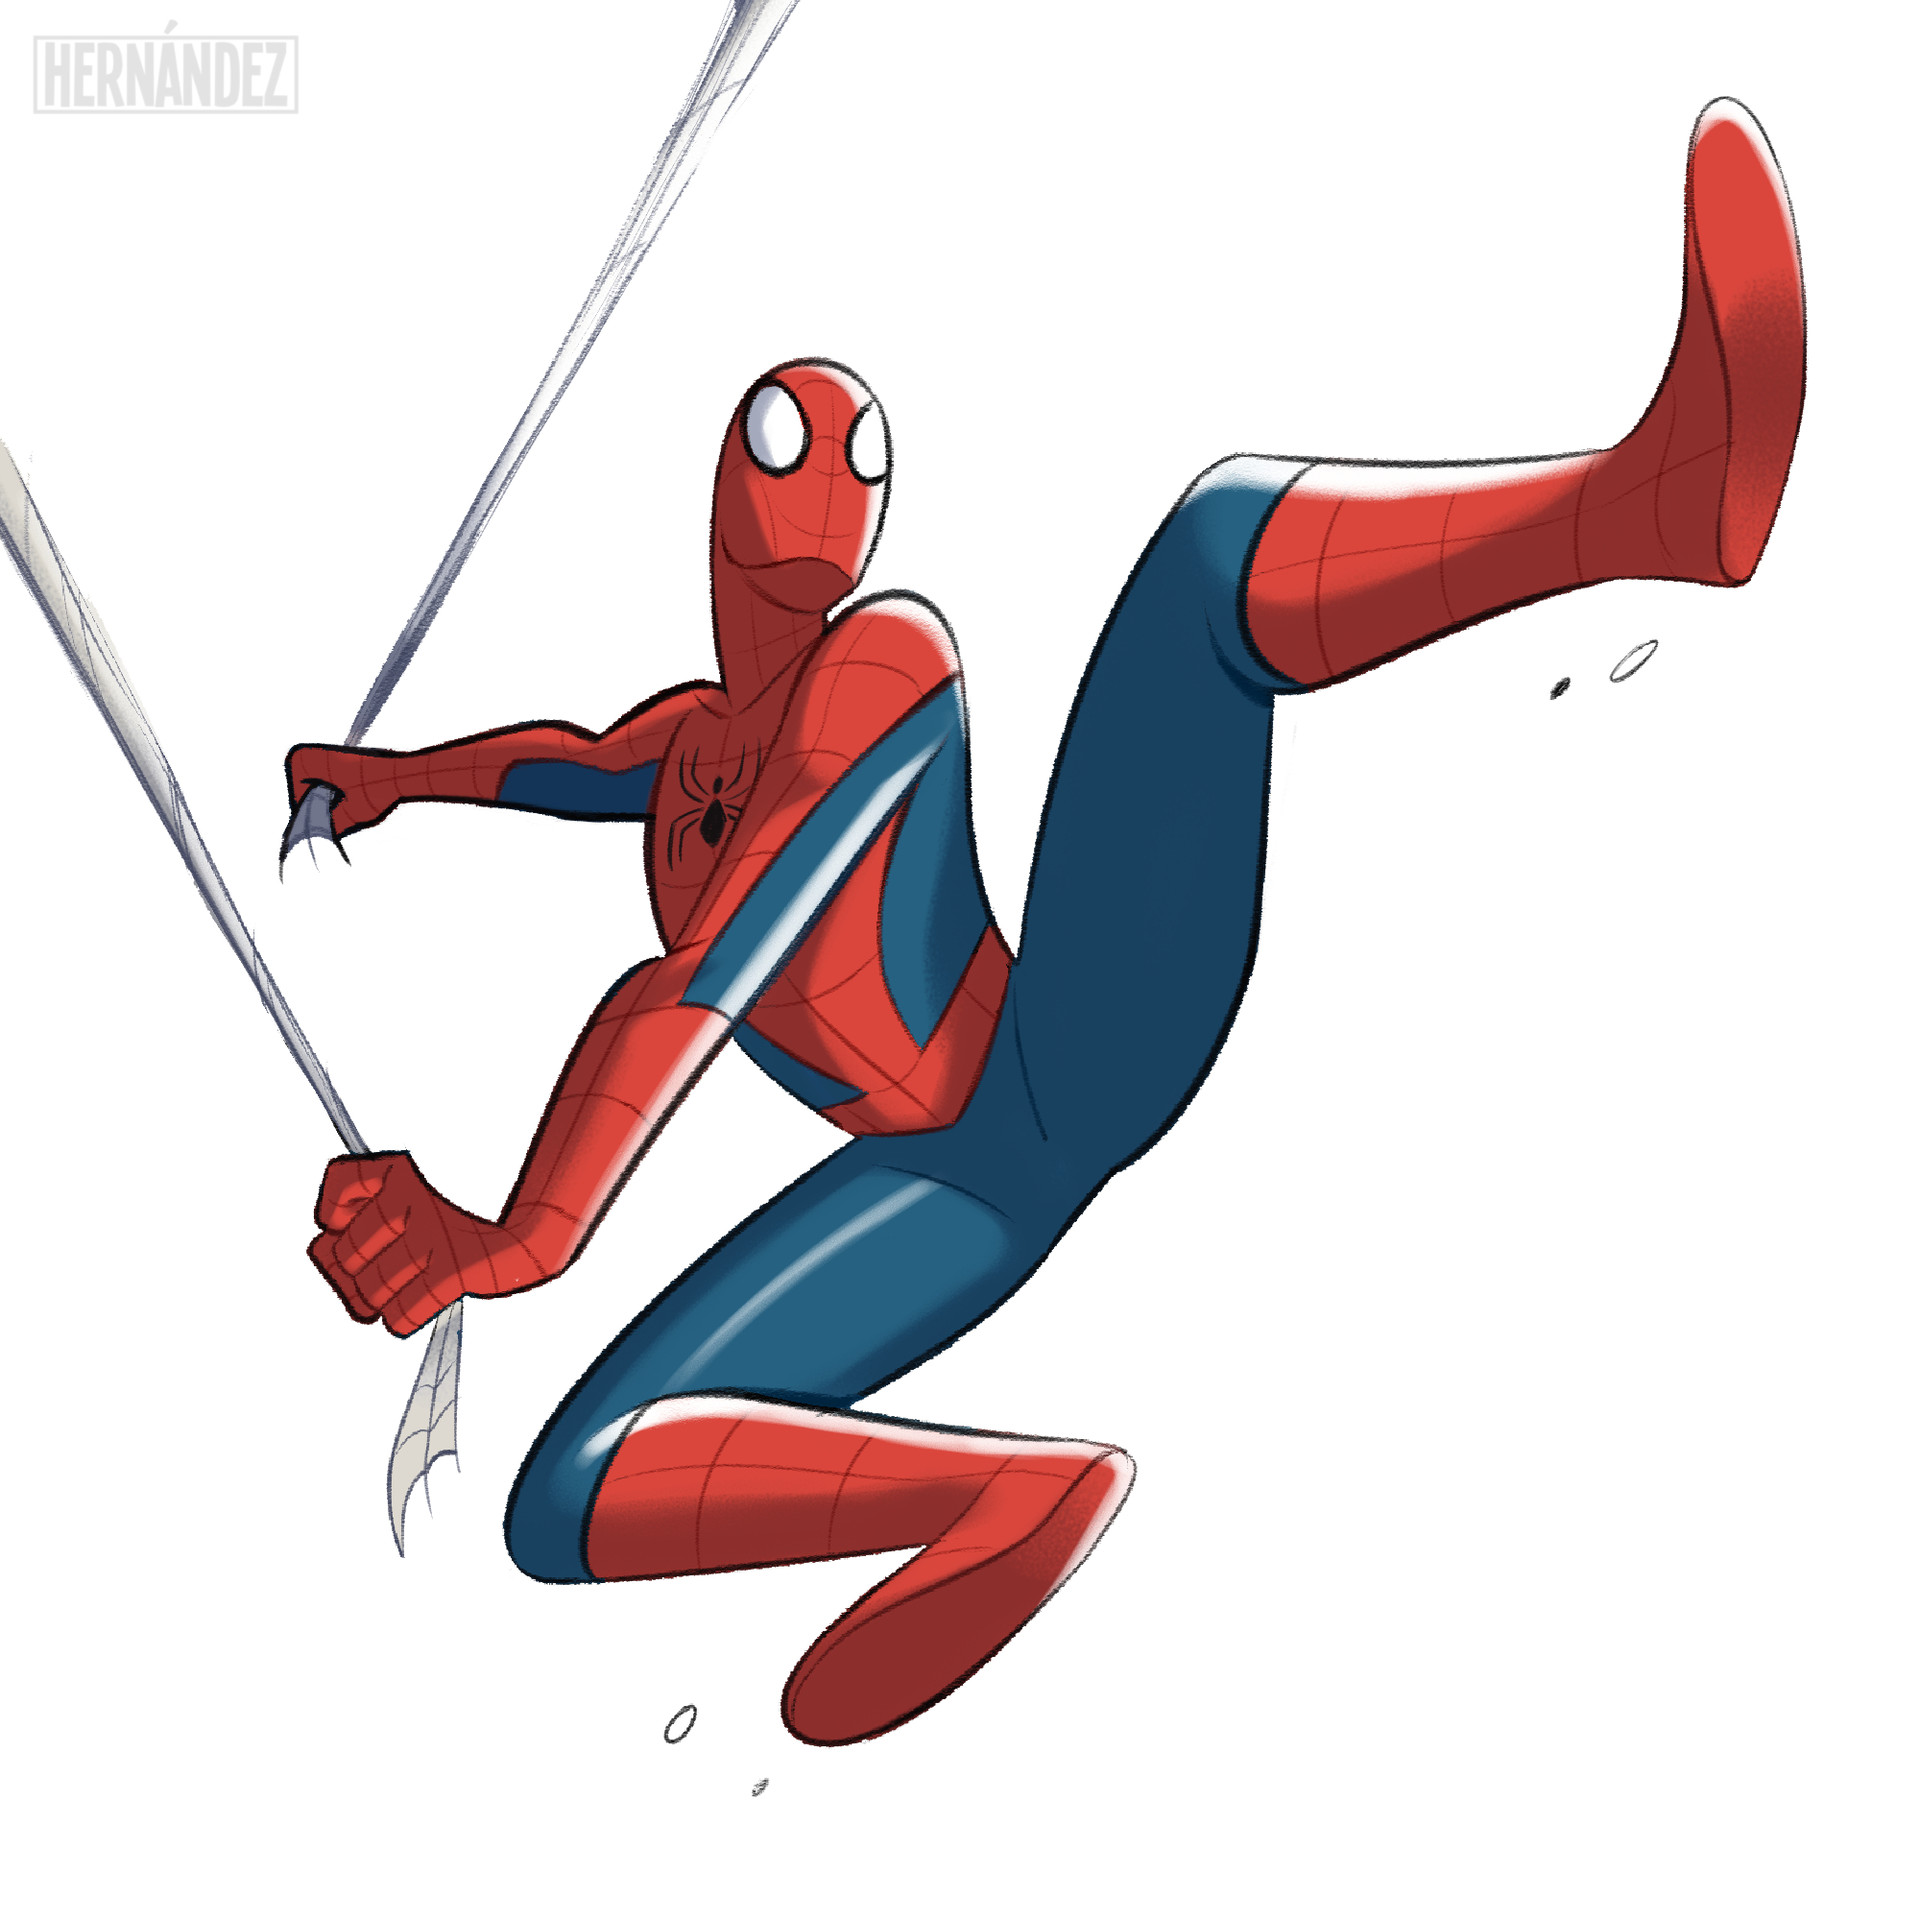 Spiderman. 2018